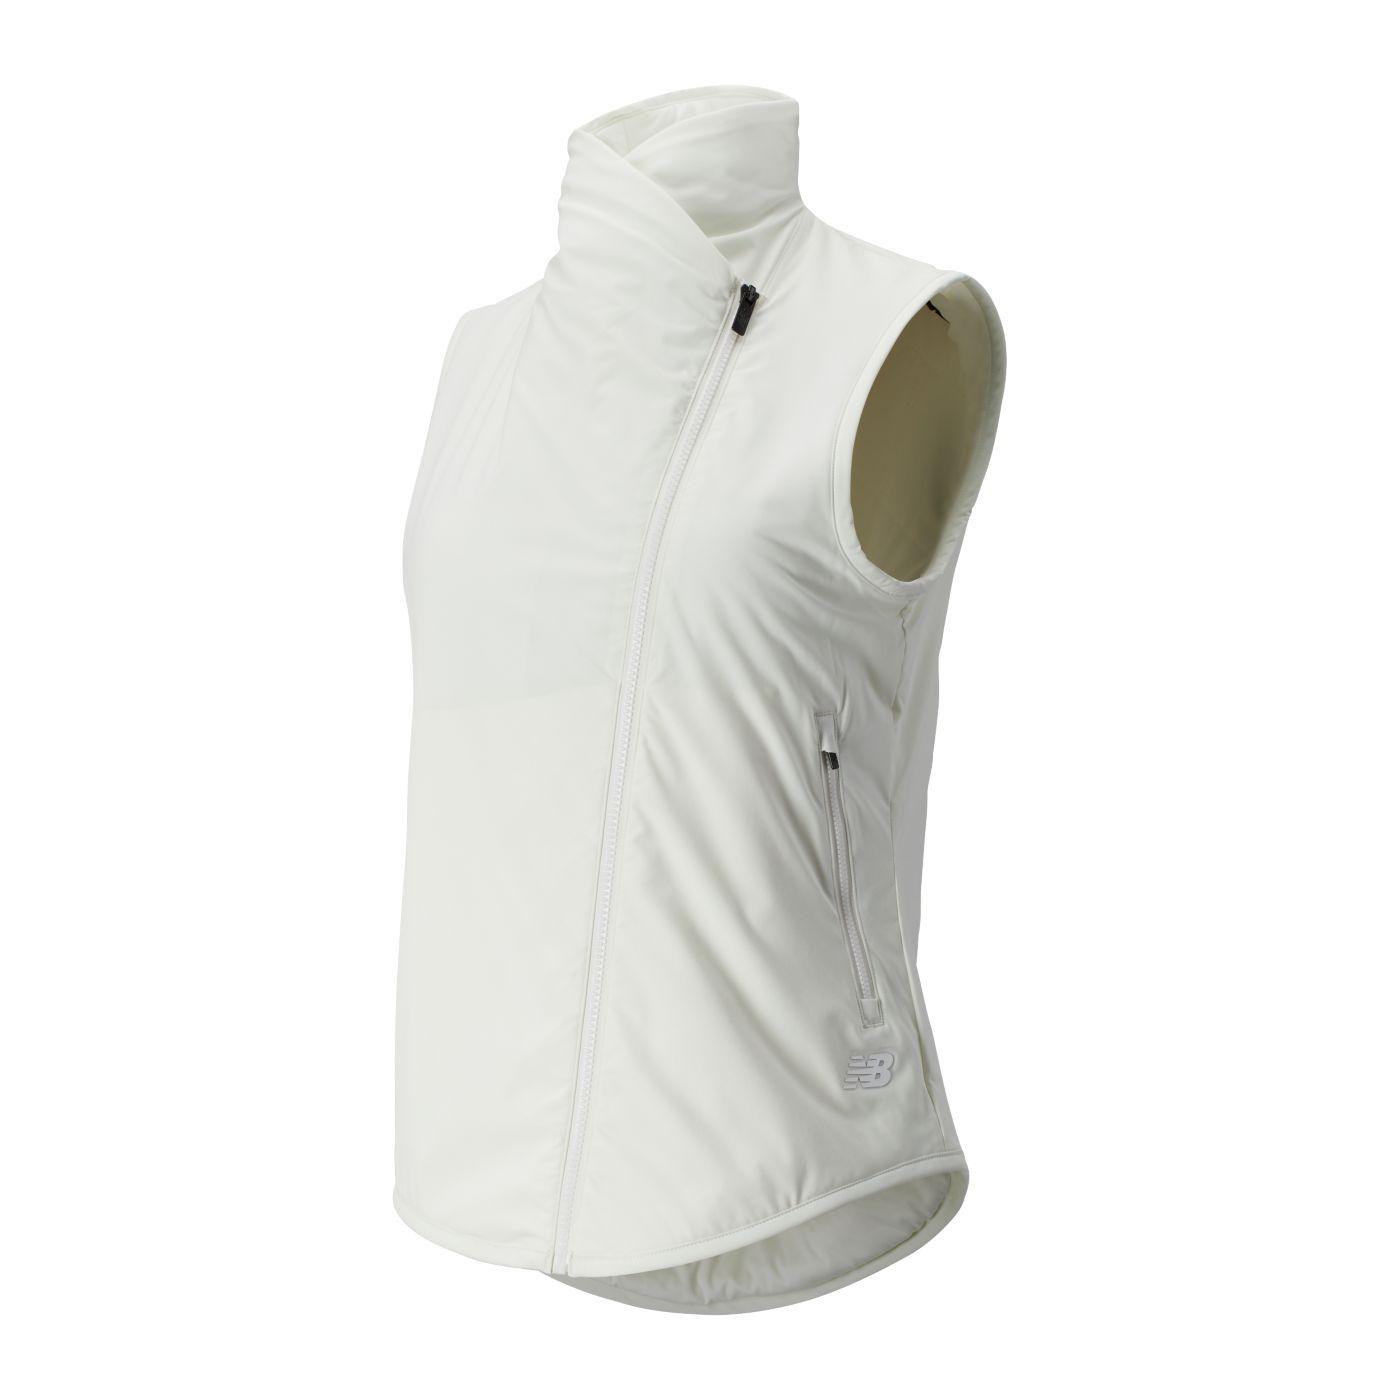 New Balance Women's Heat Flex Asymmetrical Vest